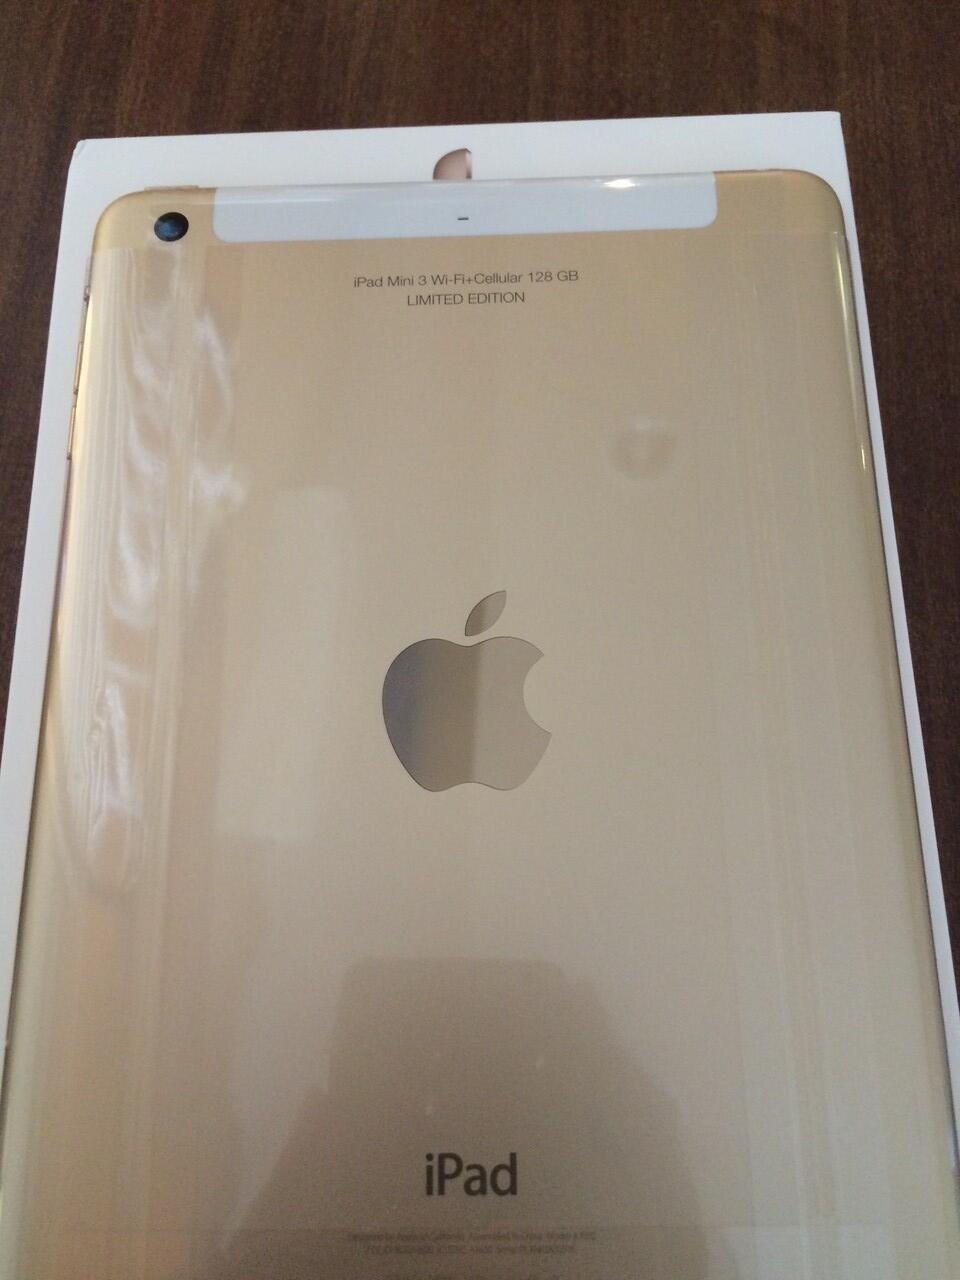 iPad Mini 3 Gold Wifi+Cellular 128 GB mulus 100 % LIMITED EDITION